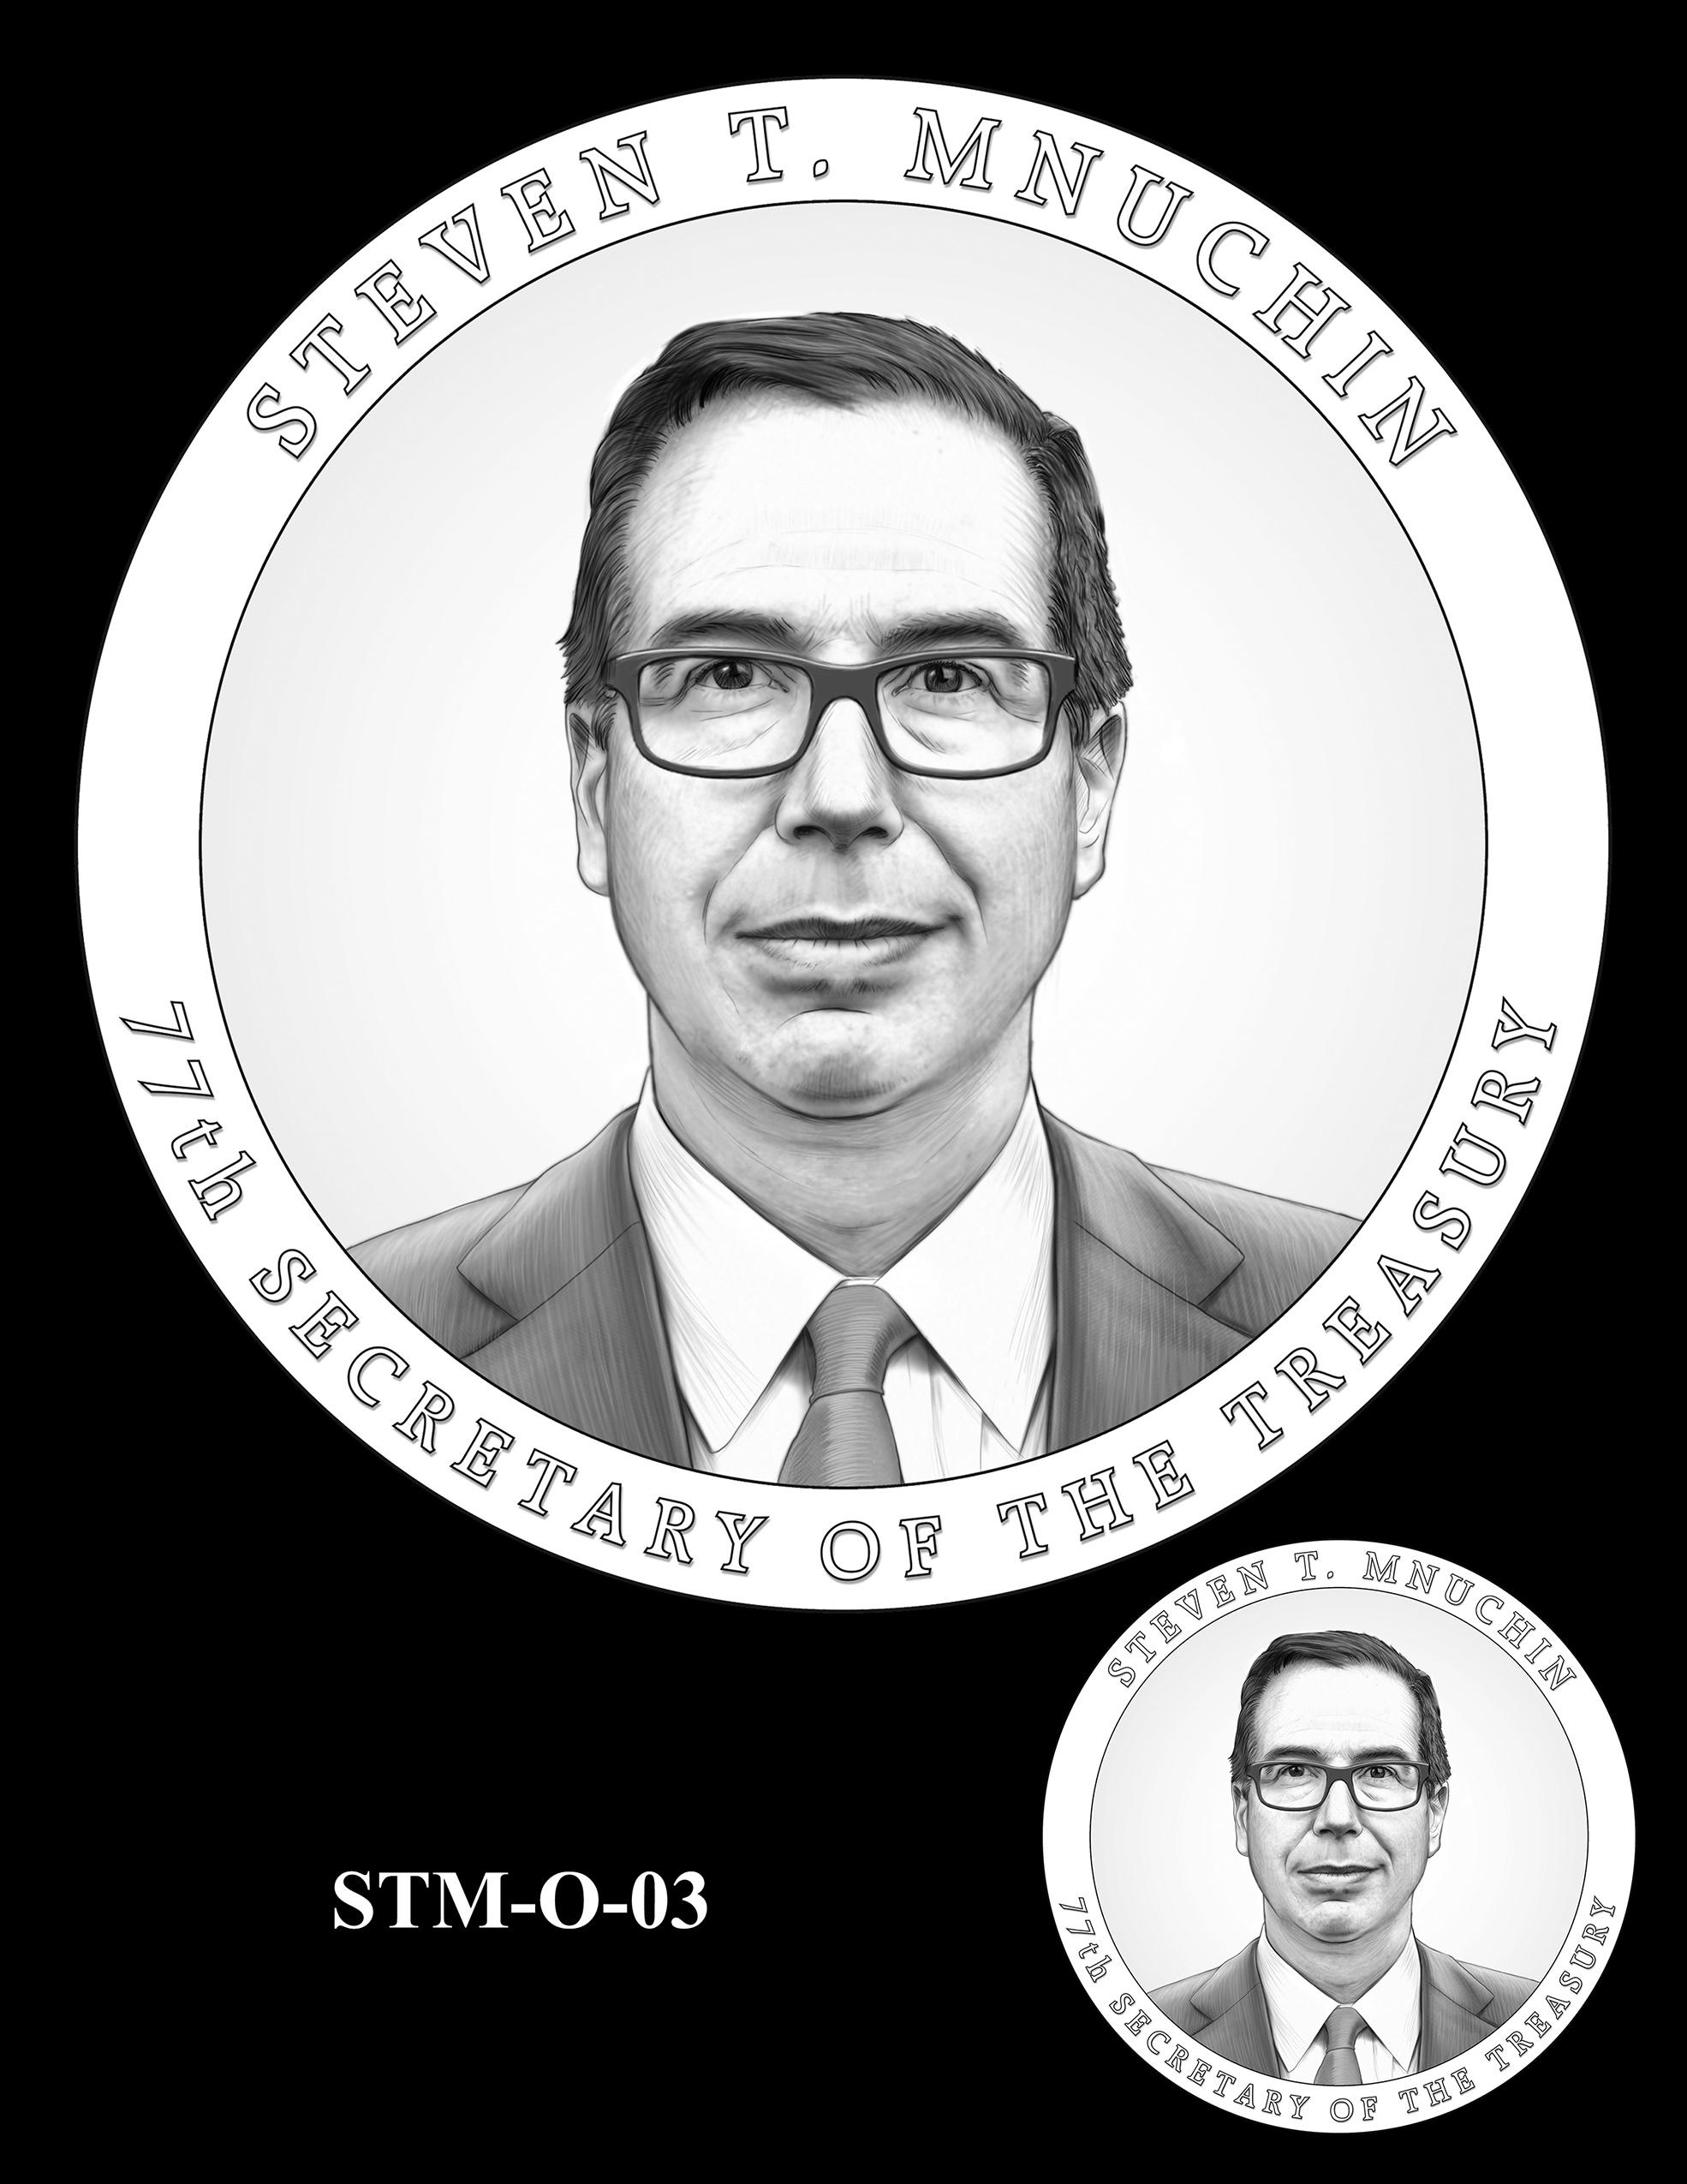 STM-O-03 -- Steven T. Mnuchin Secretary of the Treasury Medal